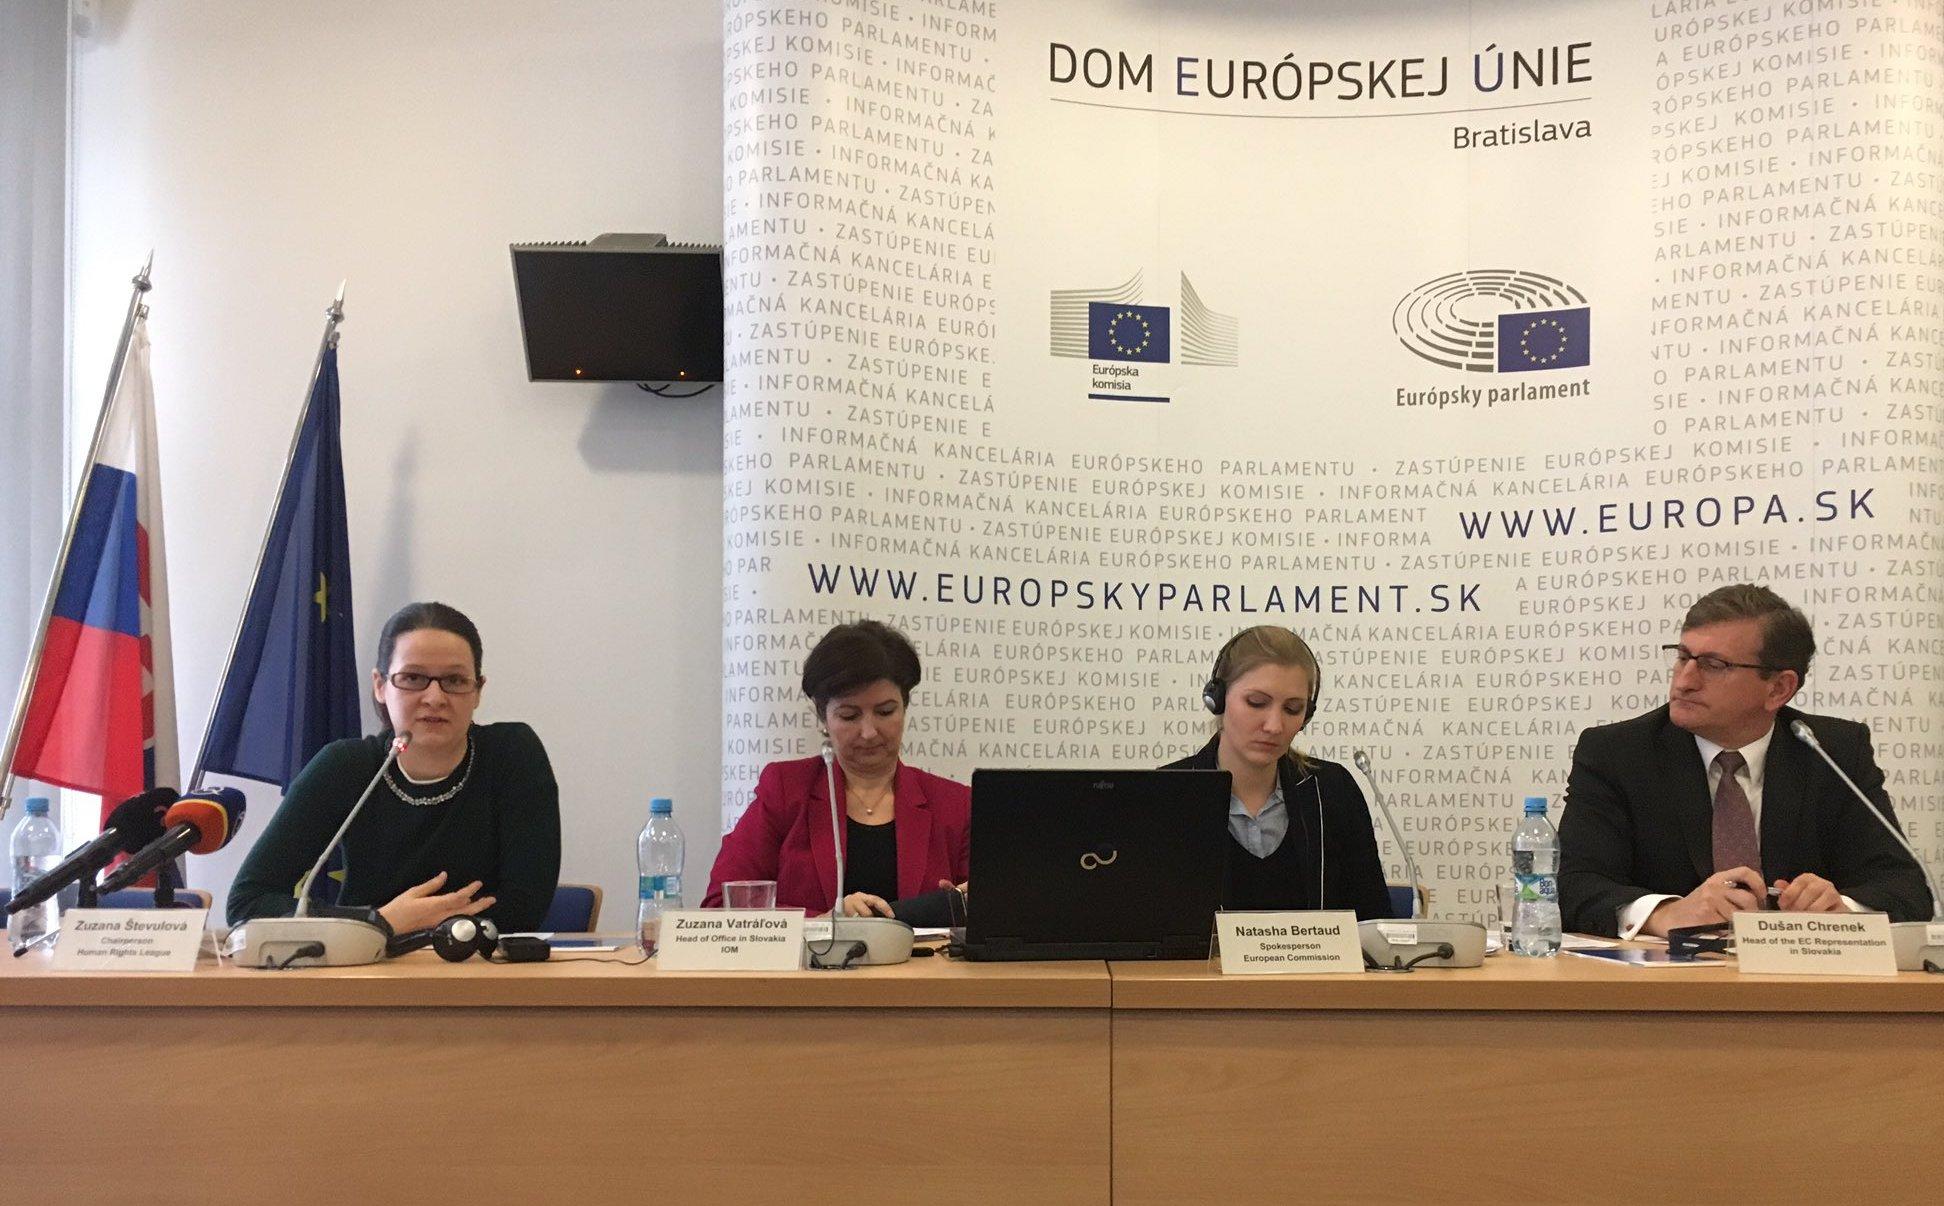 migrácia, ZEK, Dušan Chrenek, Európska komisia